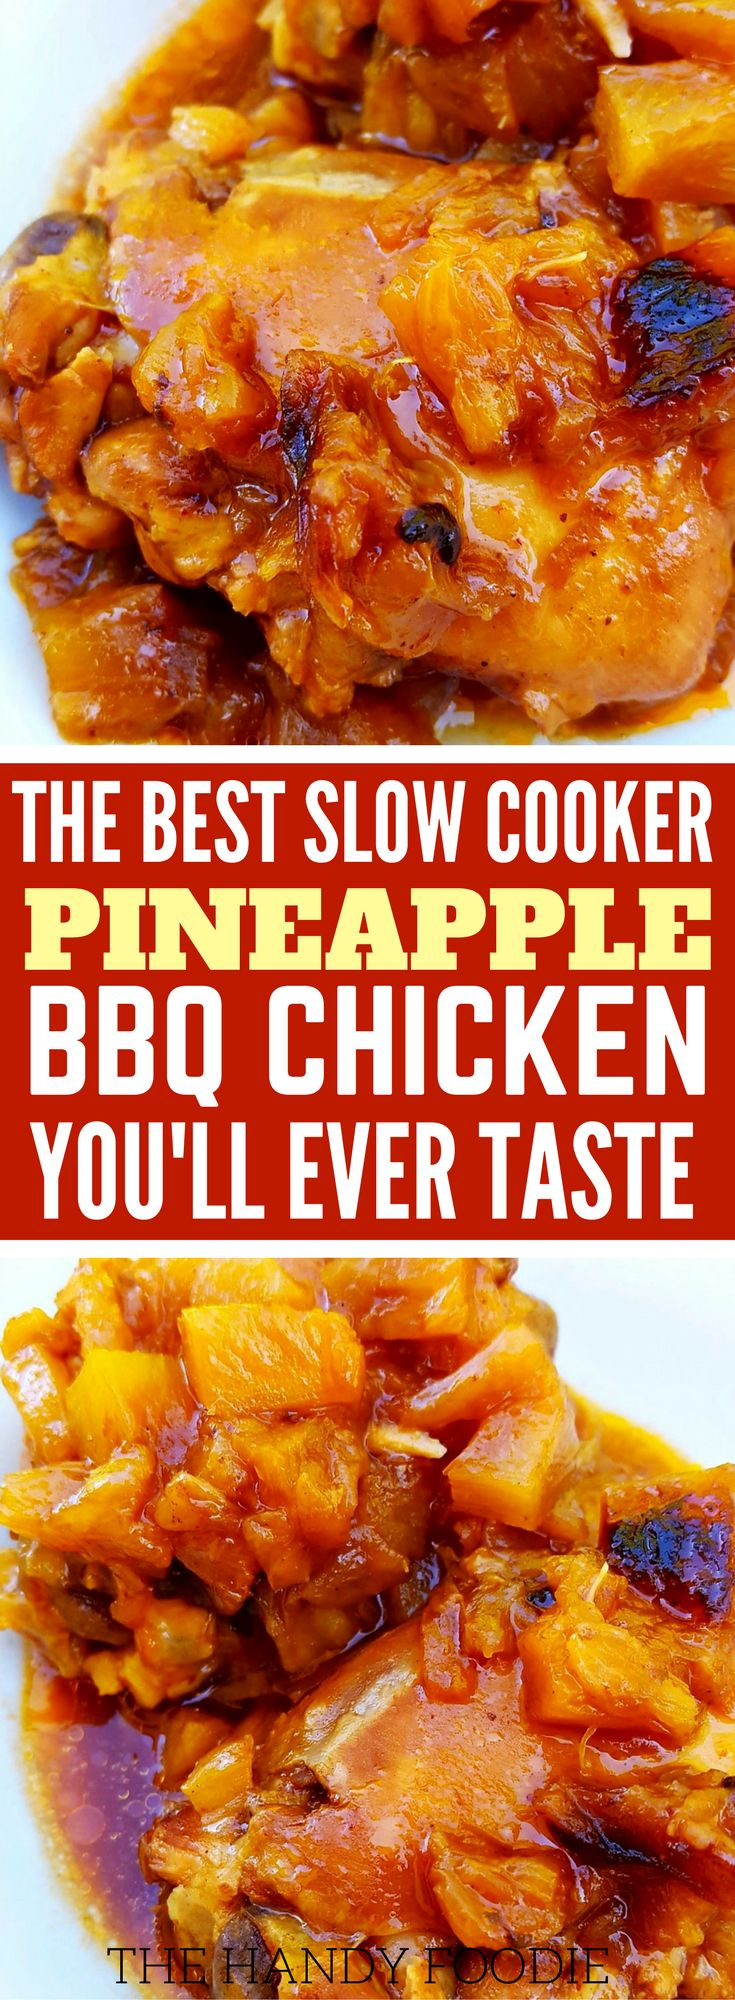 Slow Cooker Pineapple BBQ Chicken